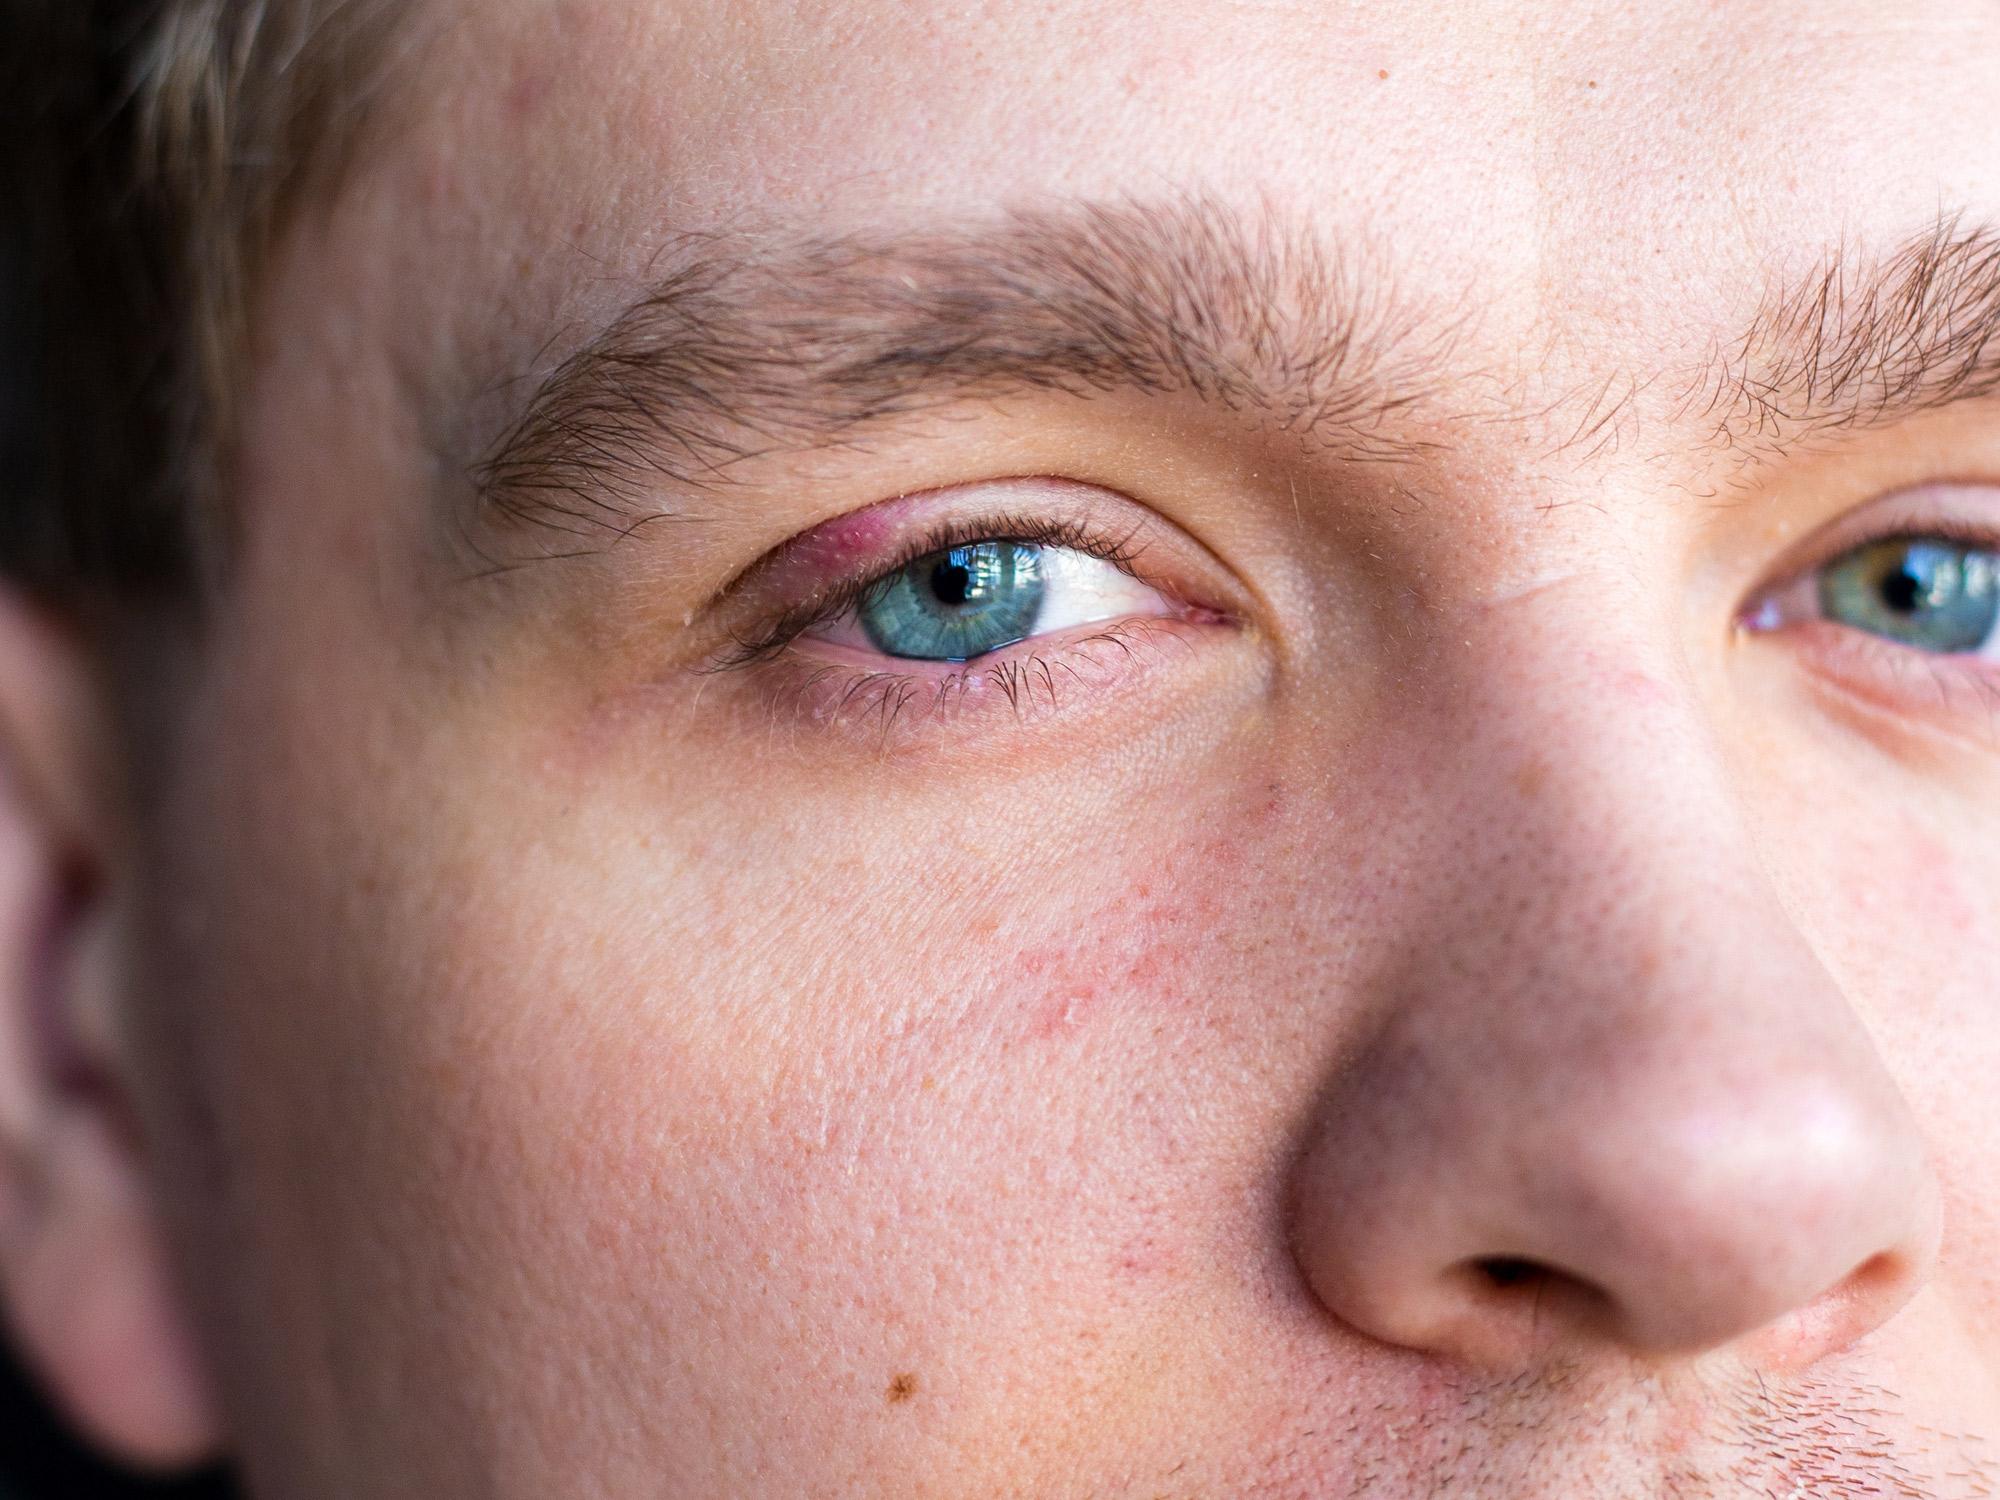 Augenwinkel entzündet innerer Verletzung innerer